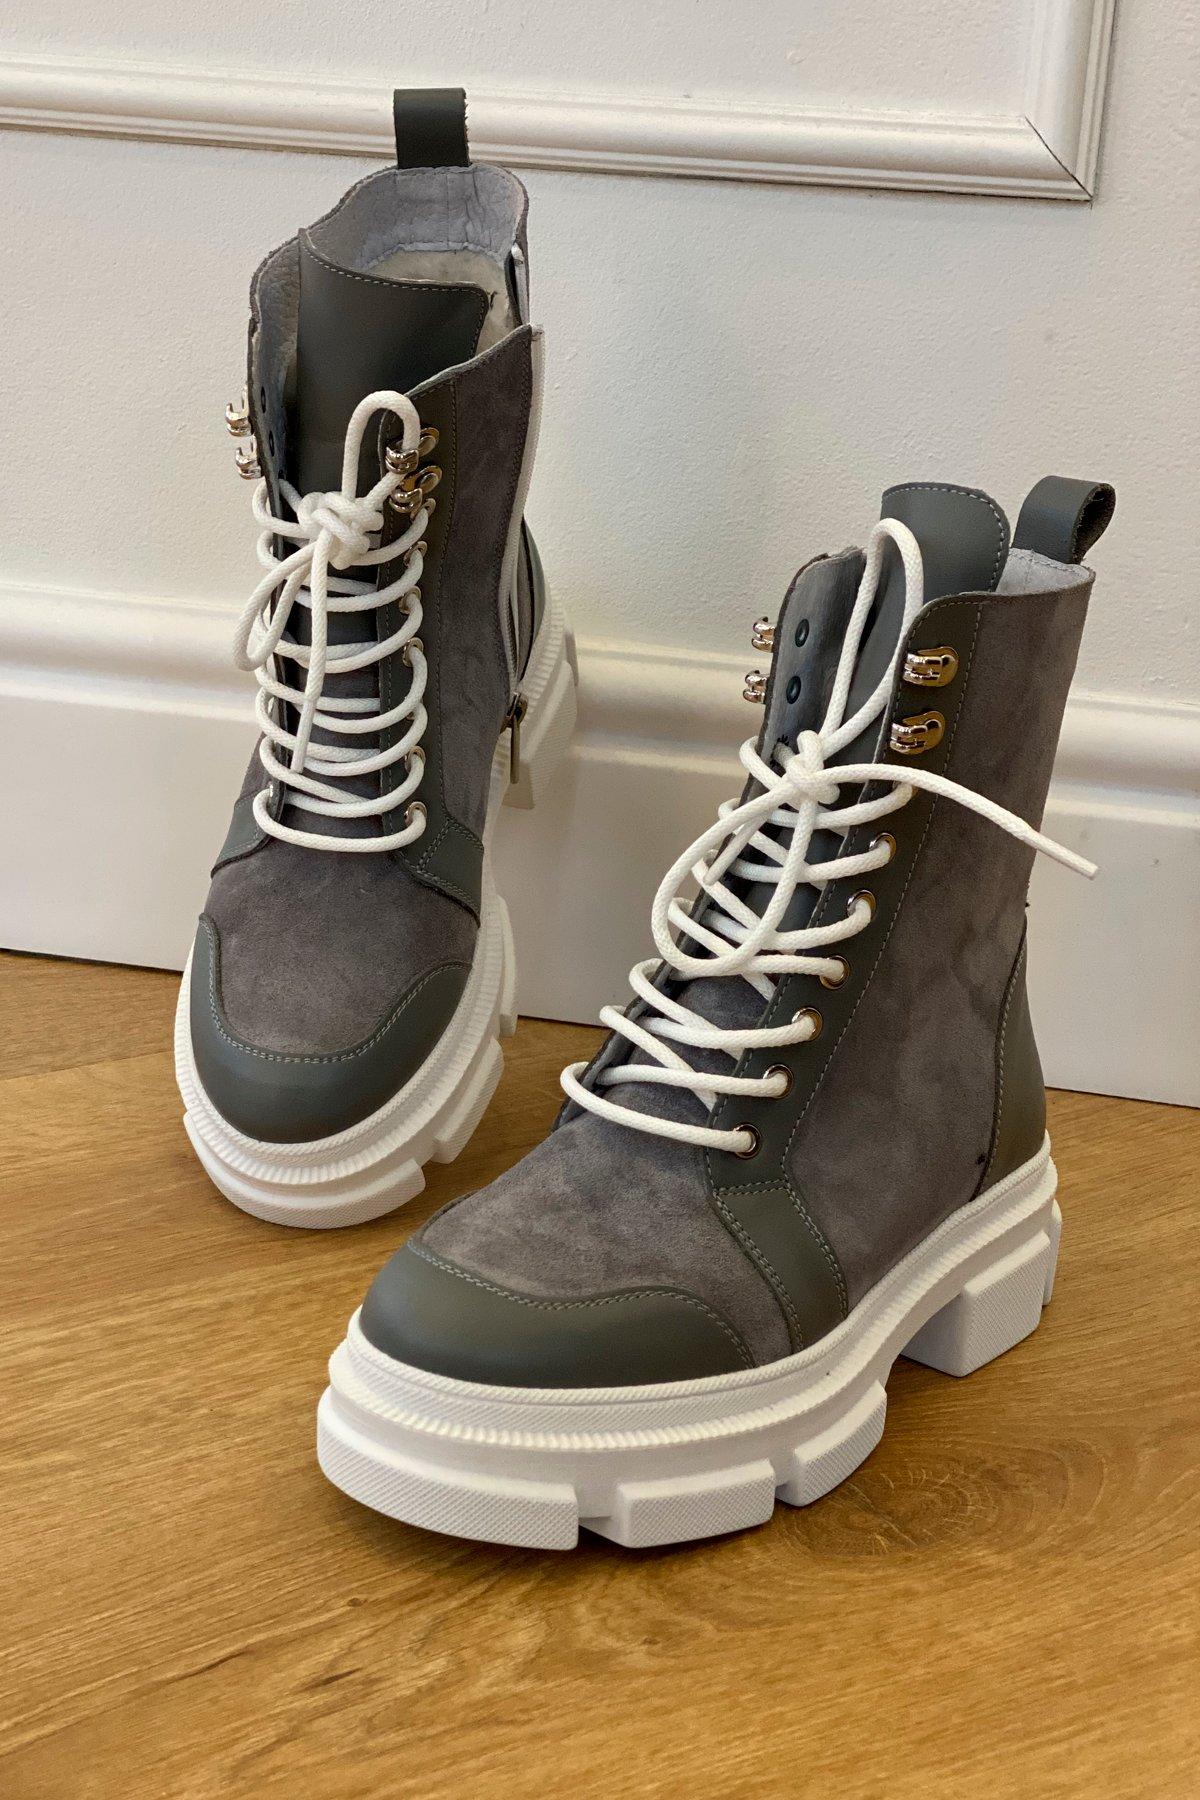 Ботинки зимние 260/14 (замш,вставки кожа,на шнурках)